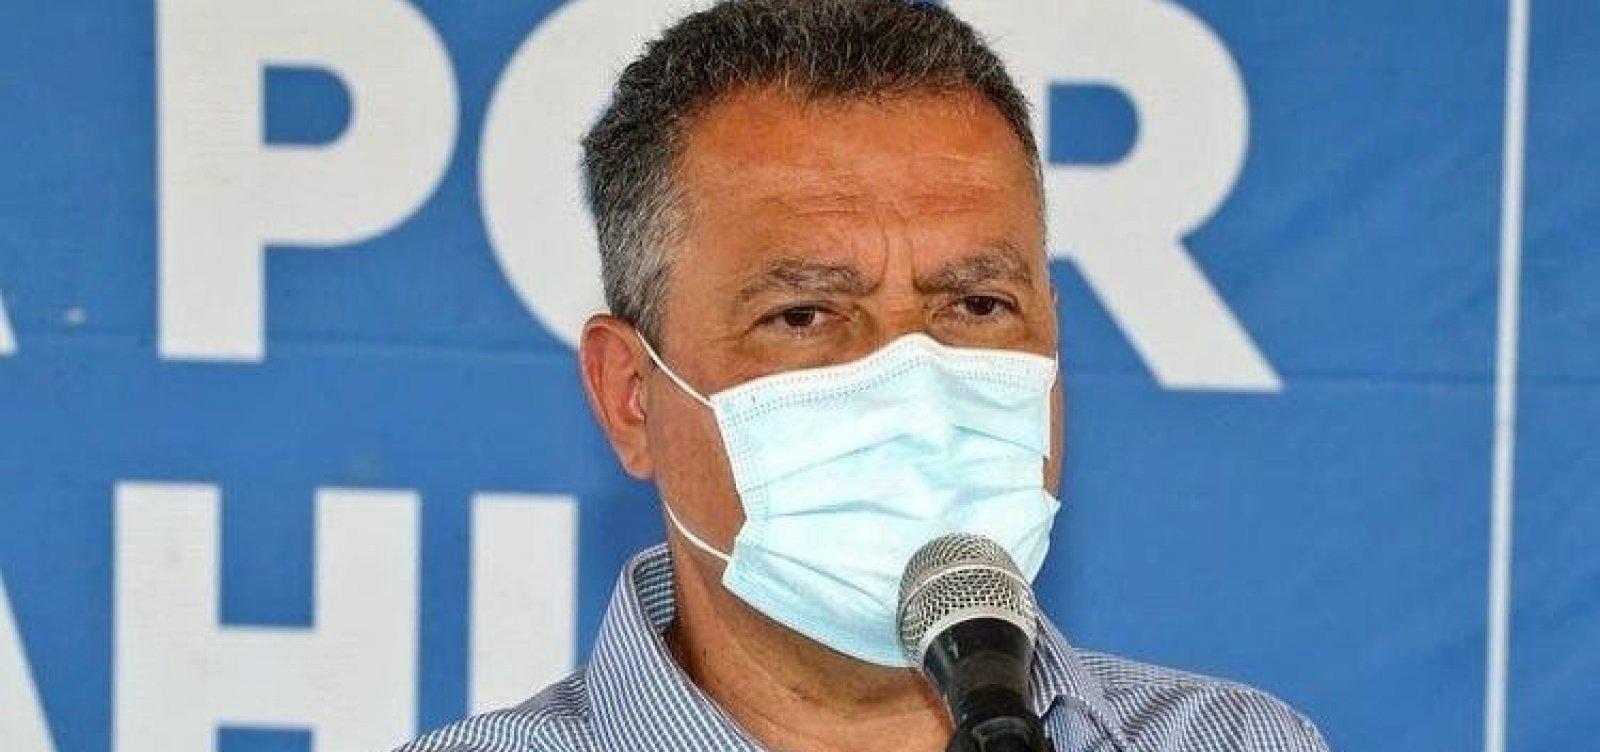 Rui Costa anuncia chegada de 119,5 mil doses da vacina de Oxford à Bahia